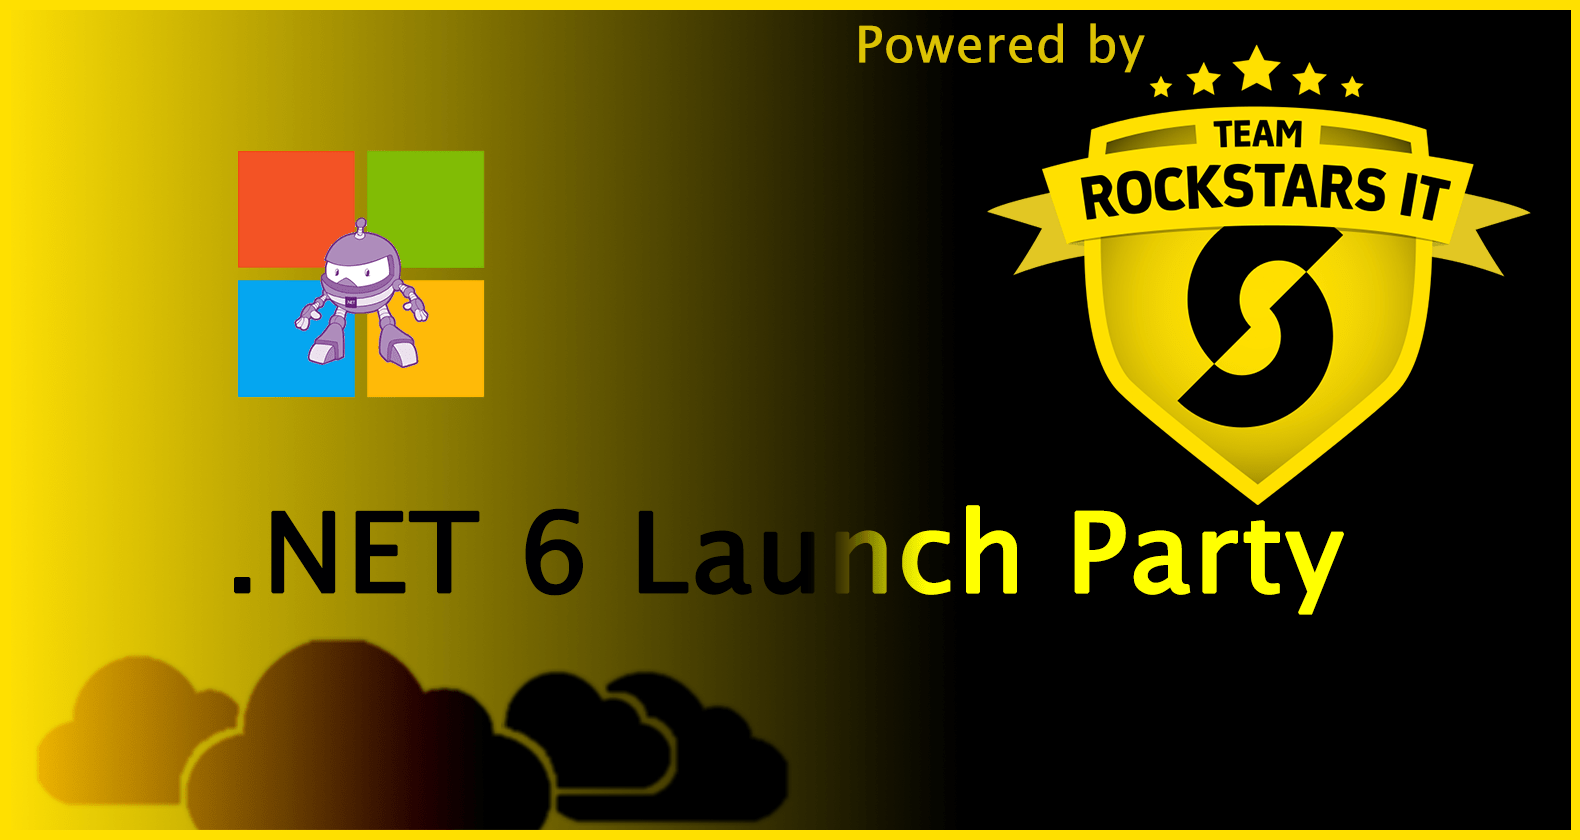 .NET 6 Launch Party